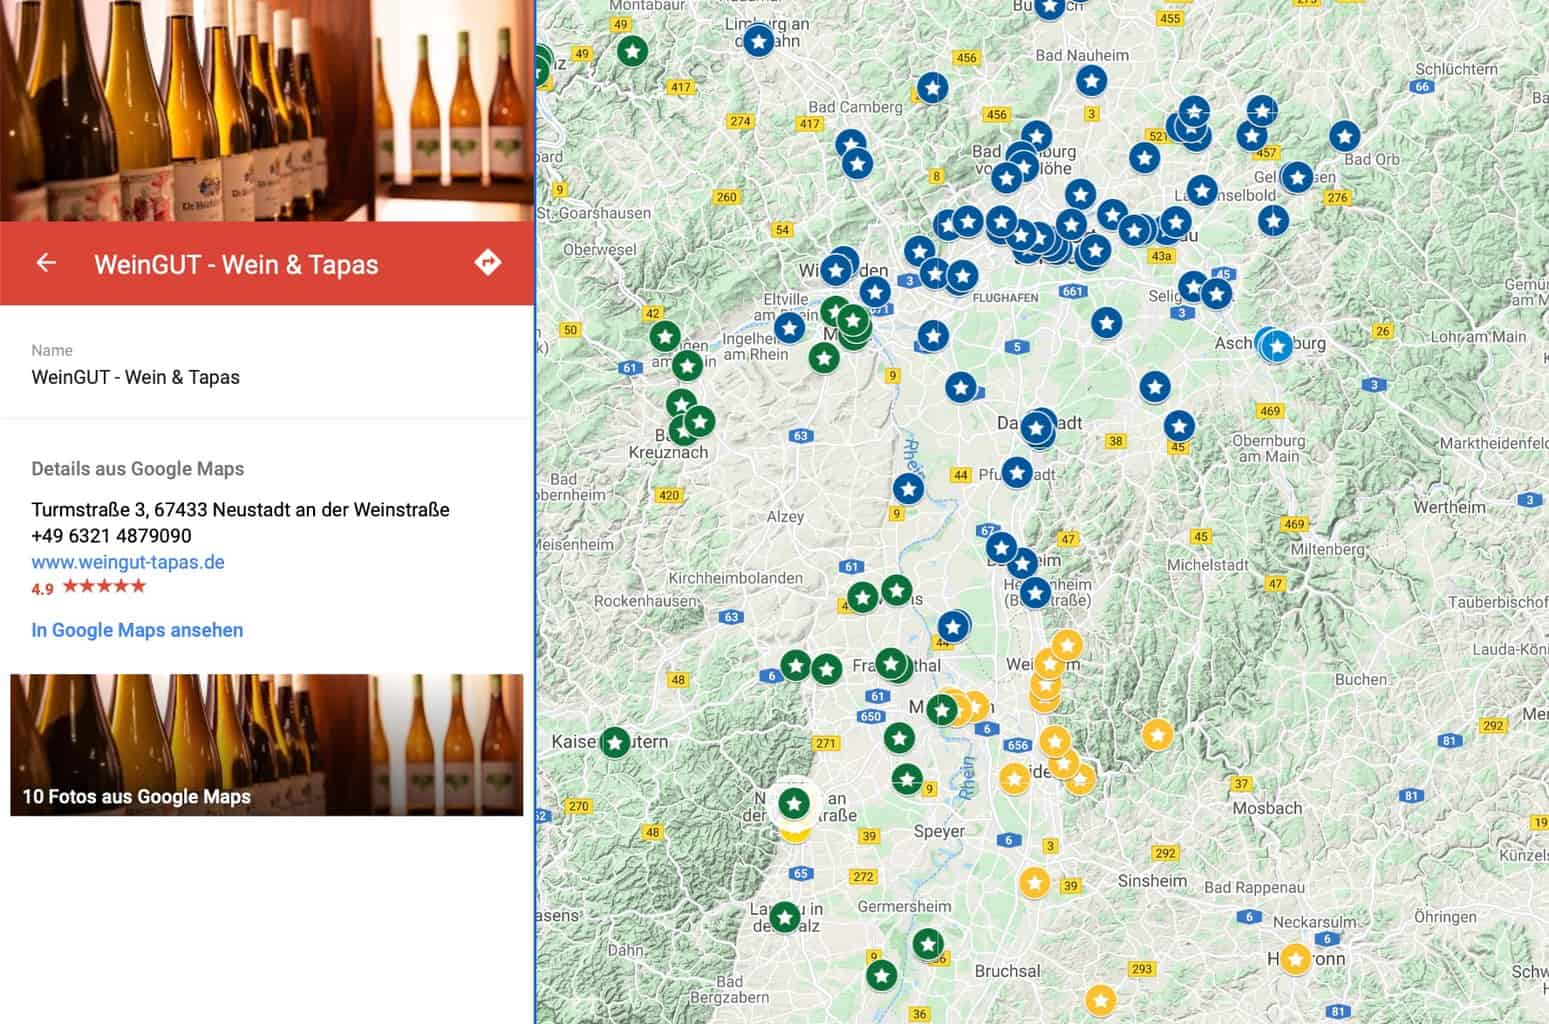 Karte-Take-Away-ToGo-Privates-Wohnmobil-Dinner-Google-My-Maps_6